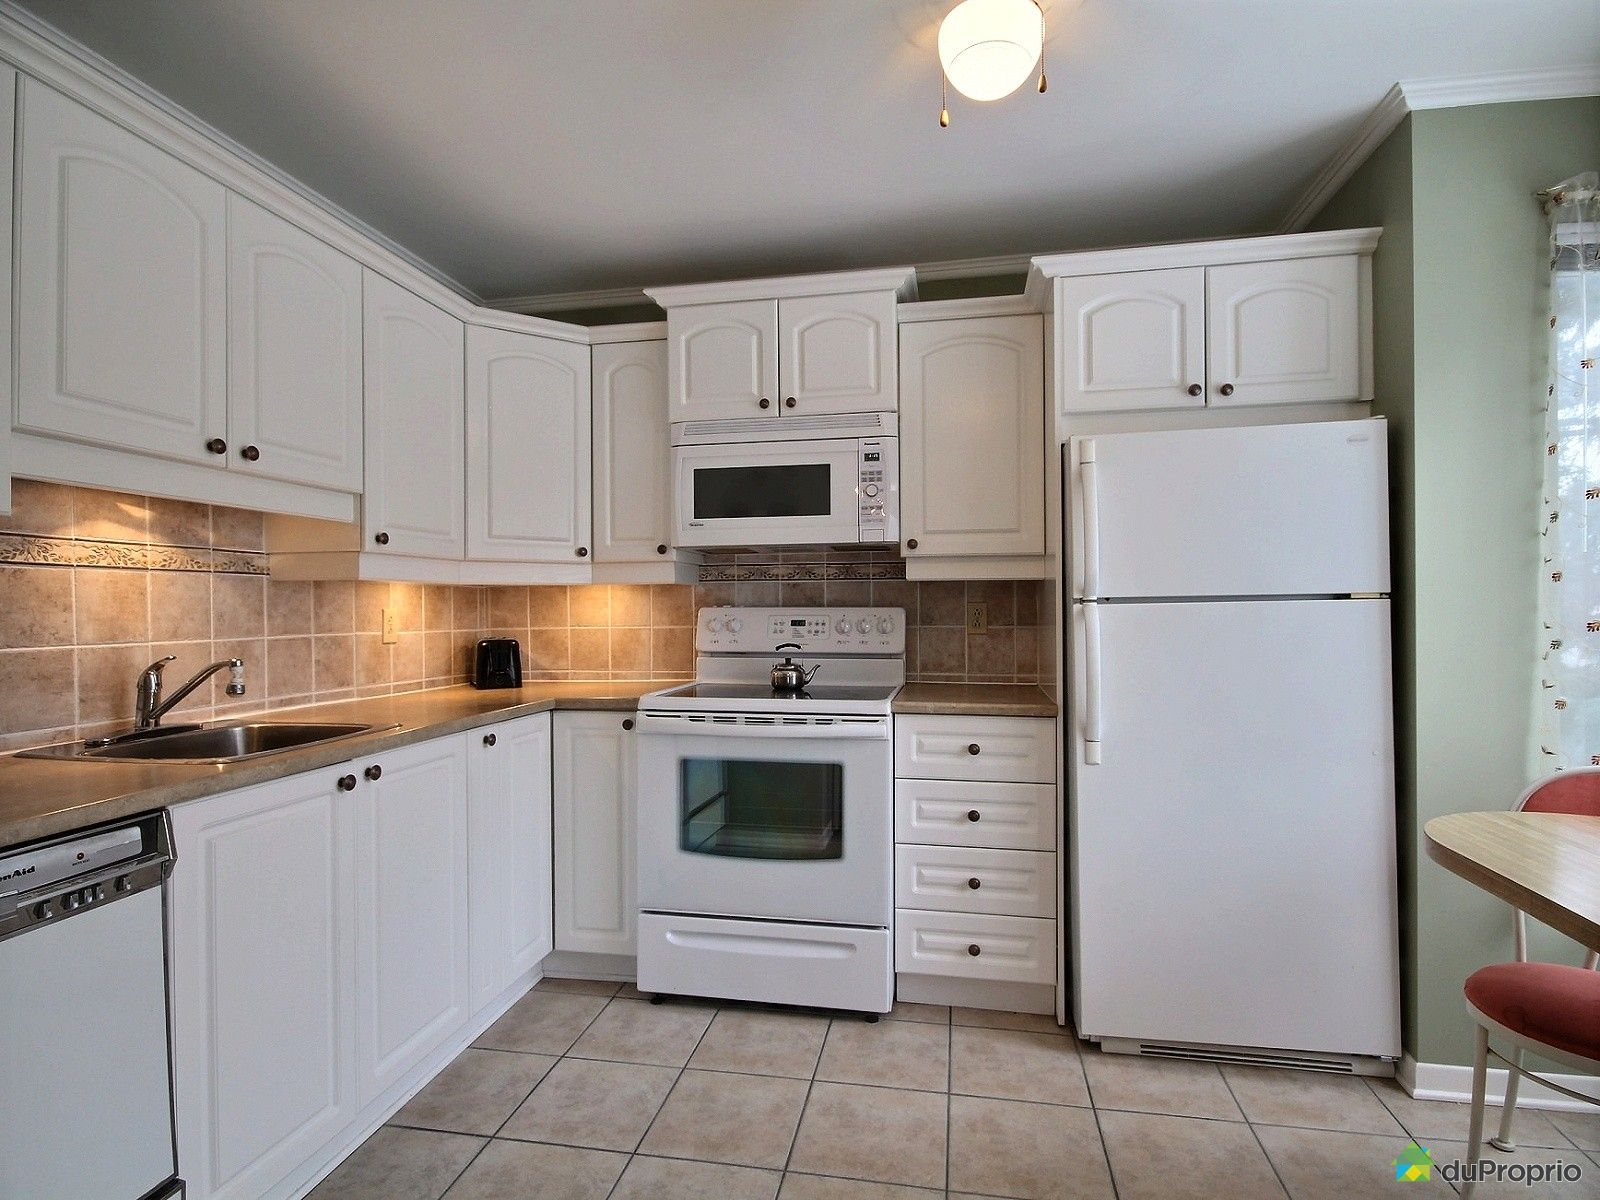 Condo vendre st bruno de montarville 105 800 rue des for Ares cuisine st bruno